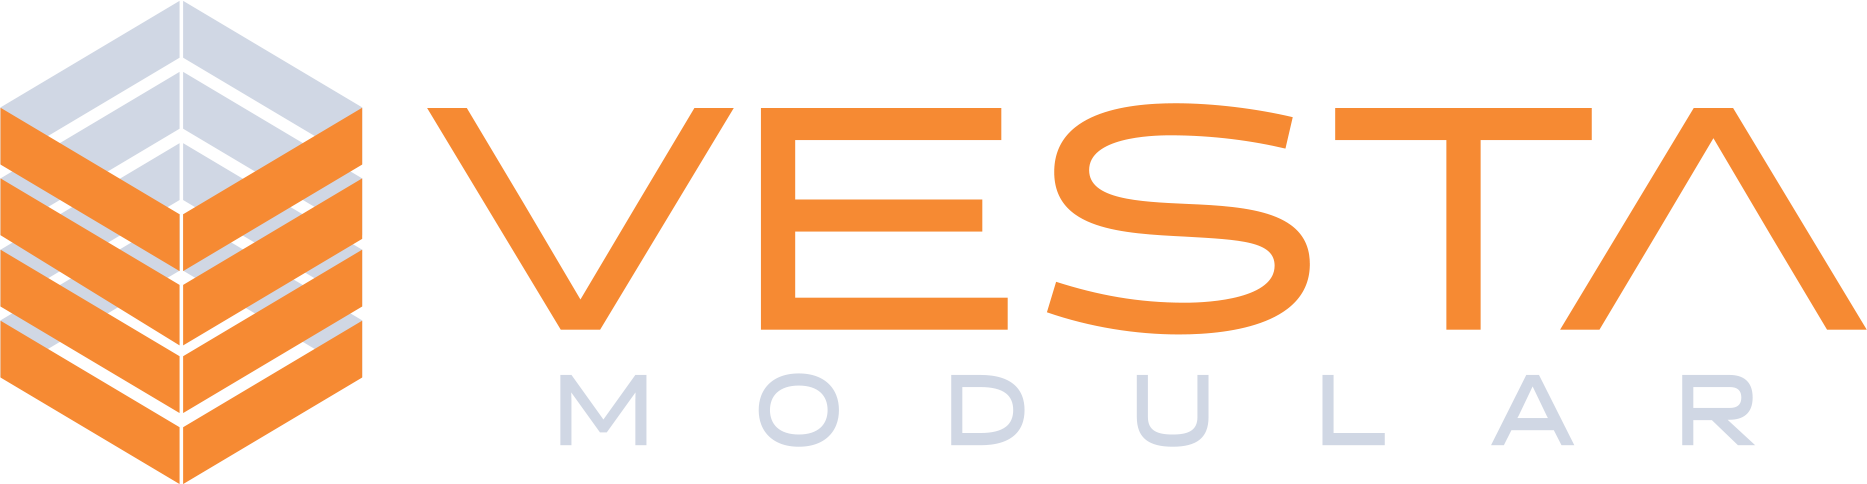 logo-lightx500